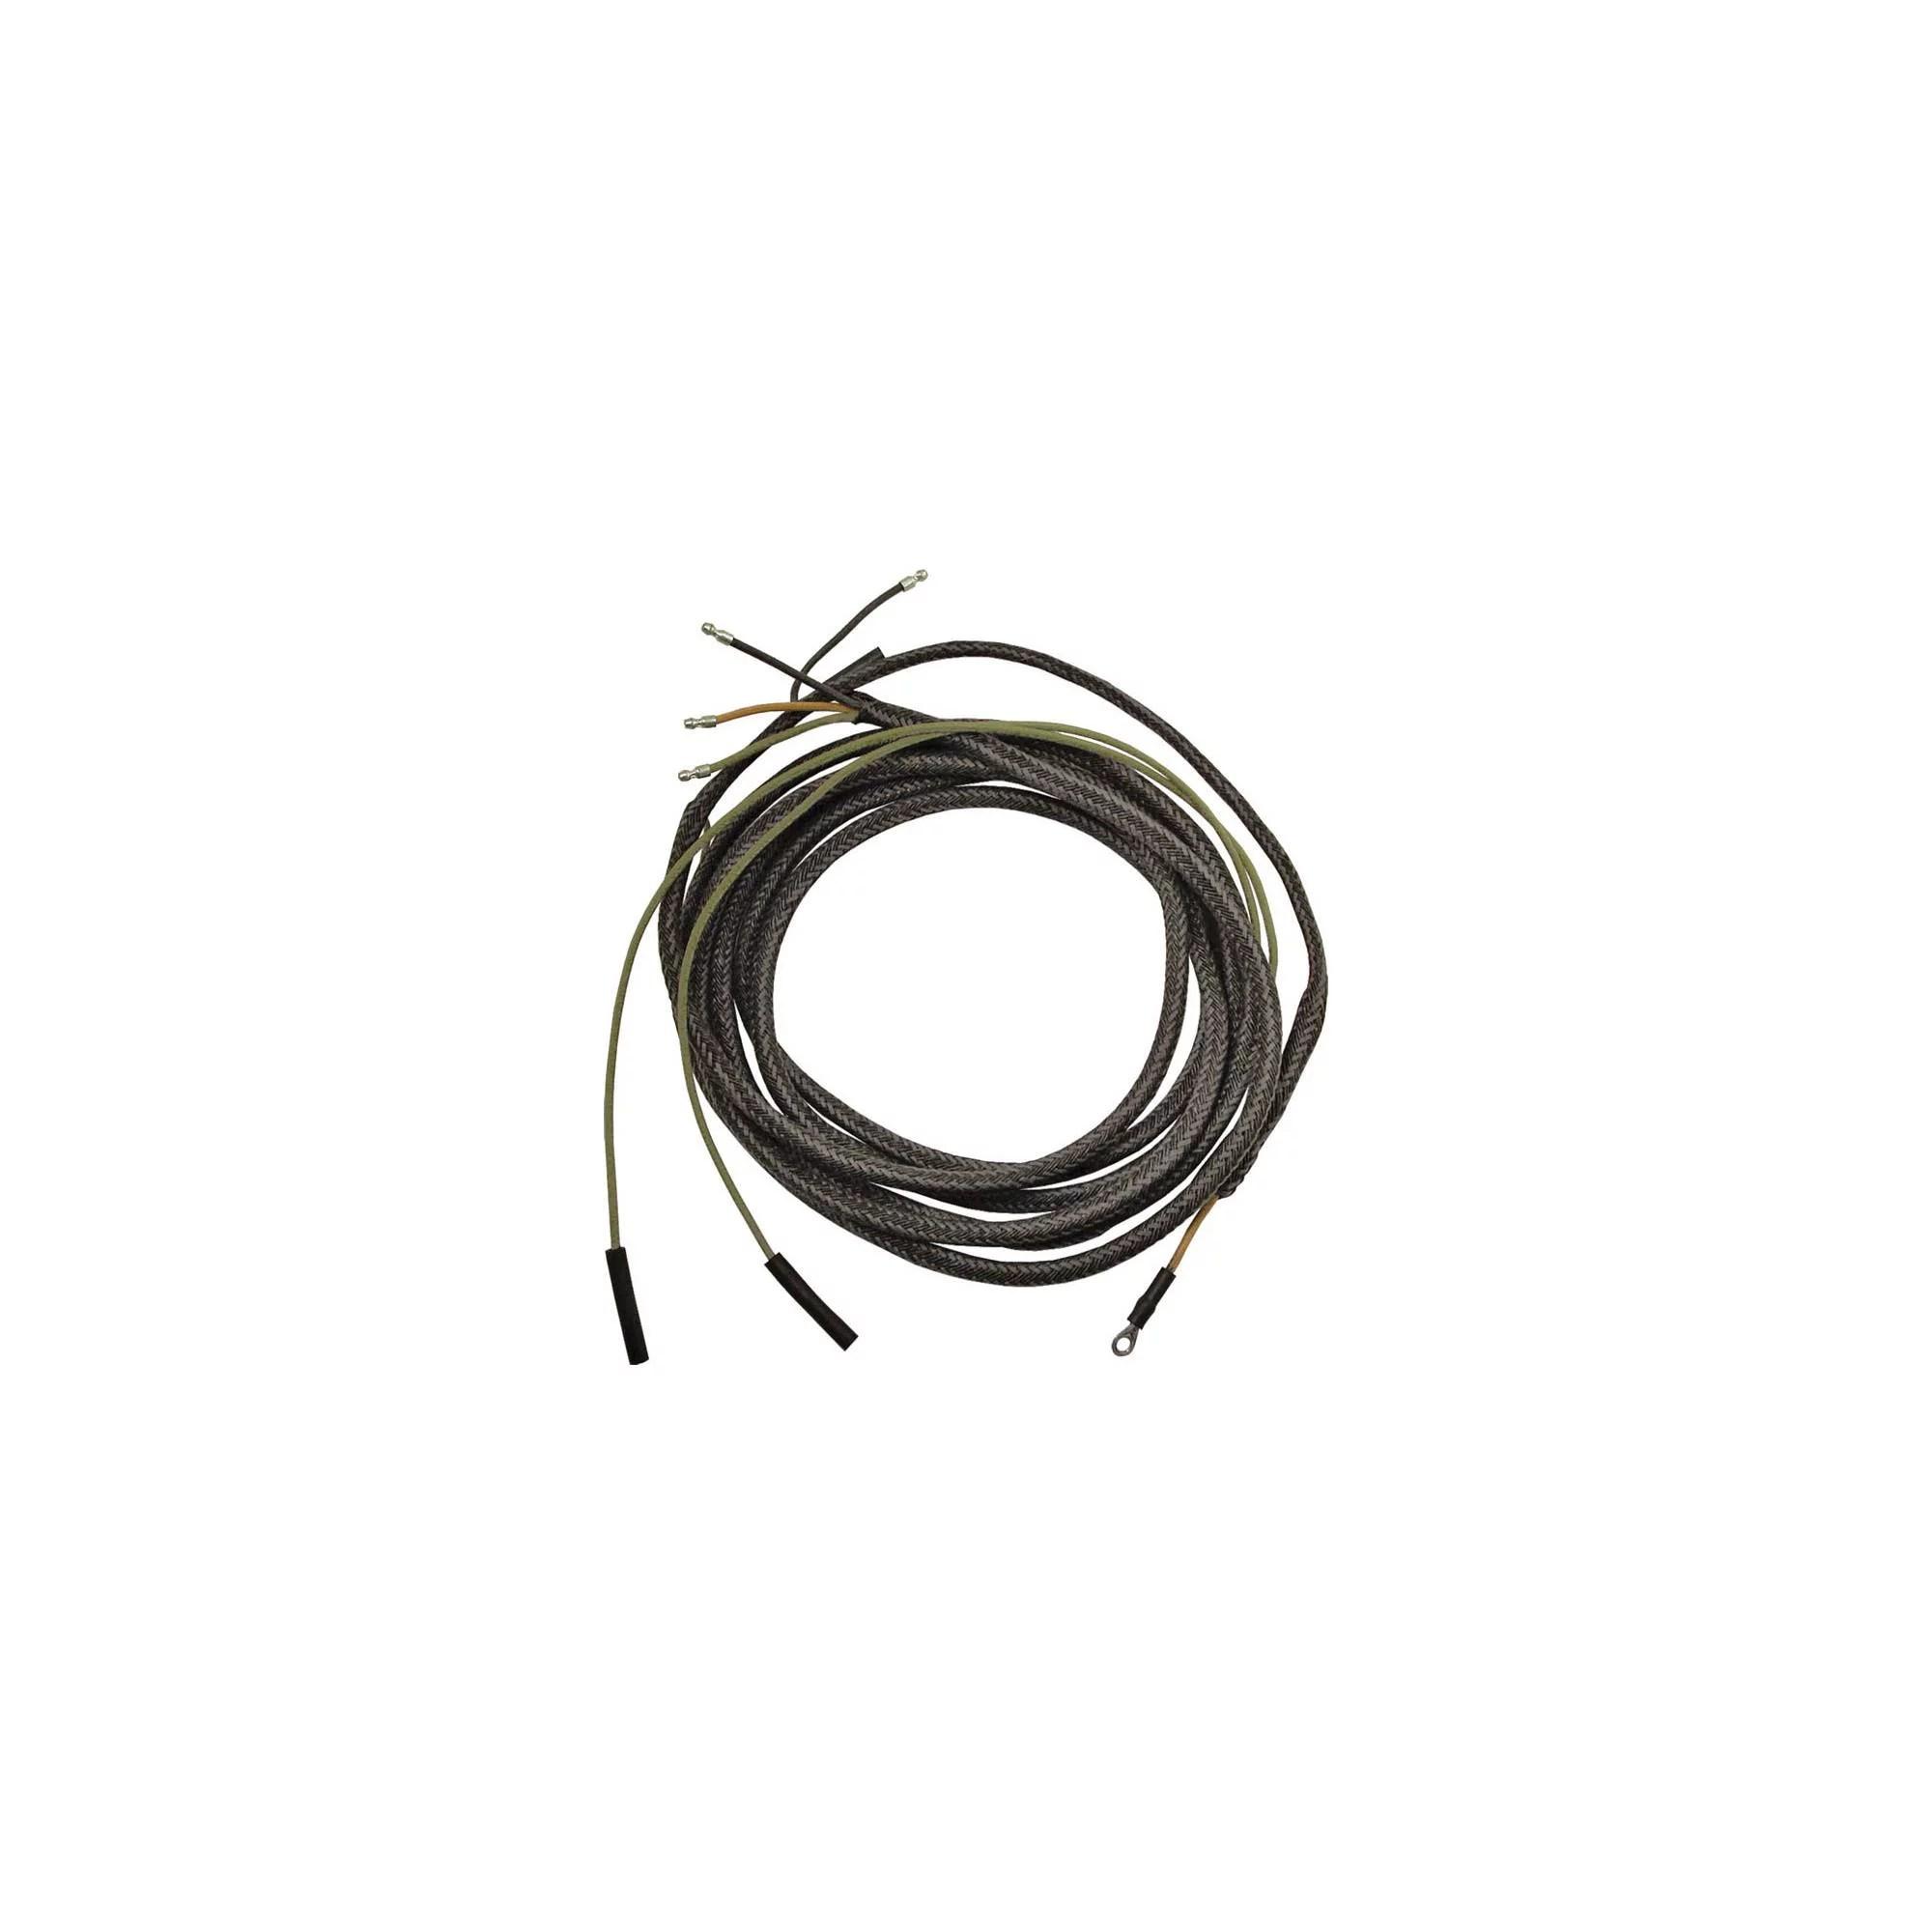 Macs Auto Parts Premier Products 47 Tail Light Wire